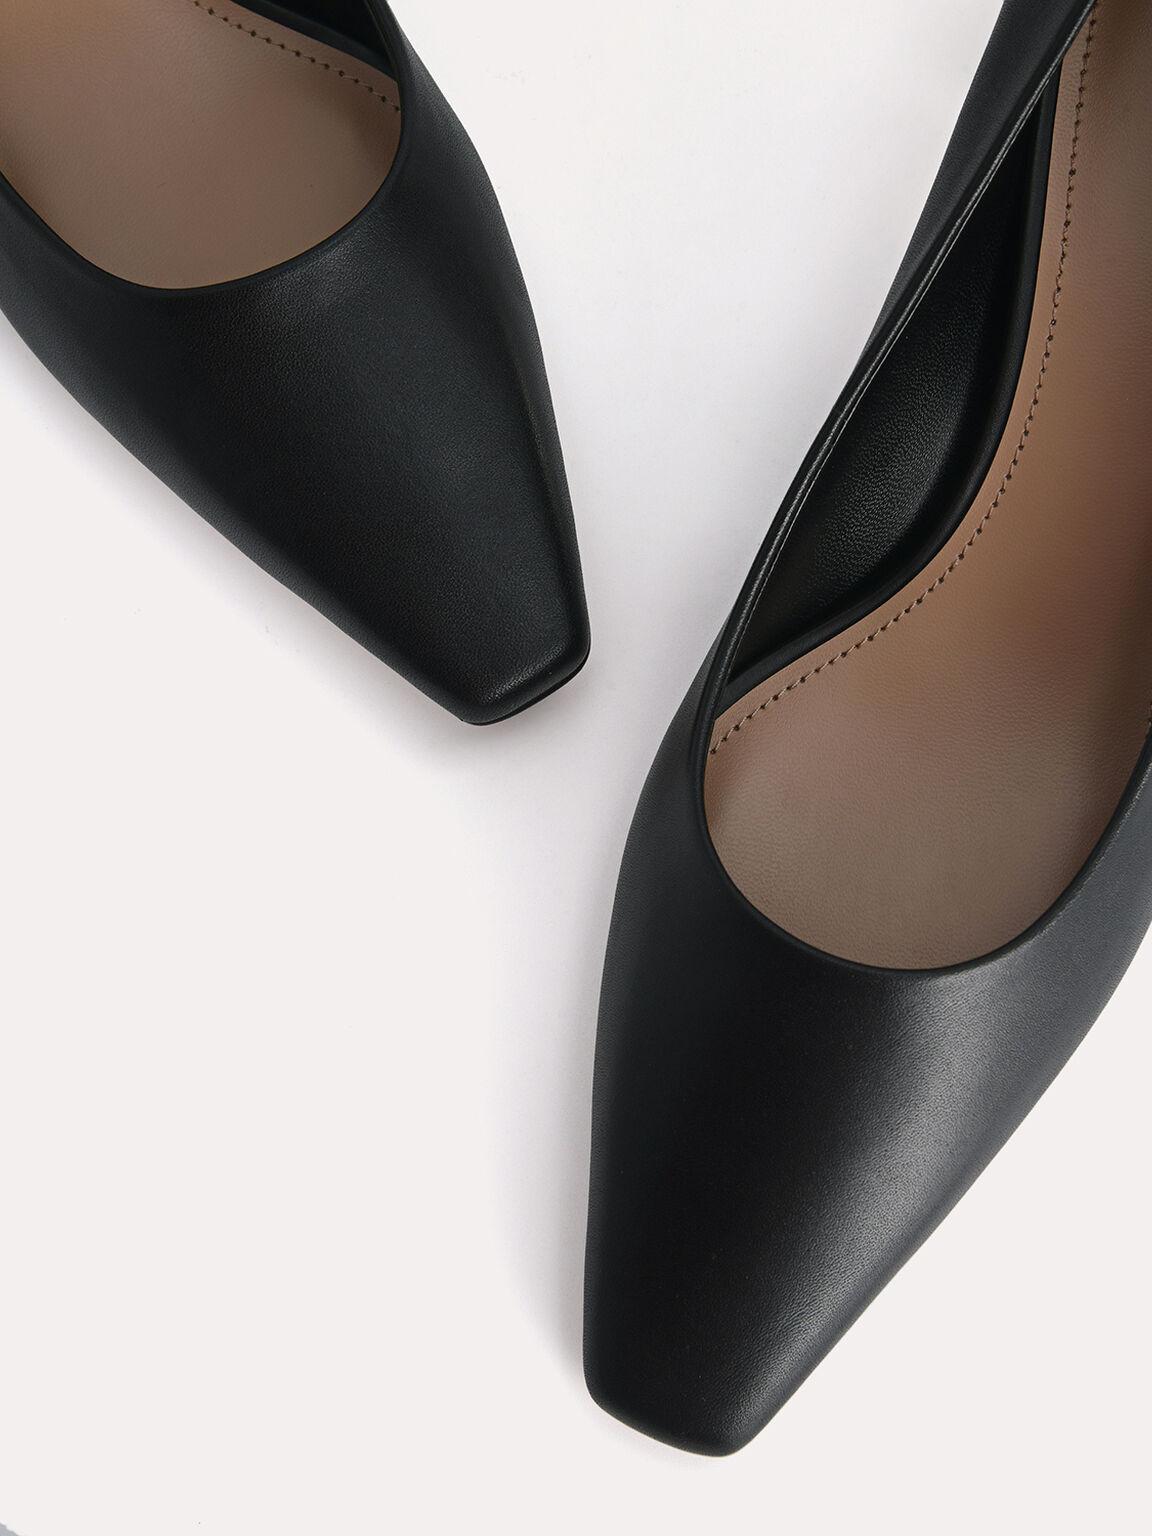 Square-Toe Leather Pumps, Black, hi-res